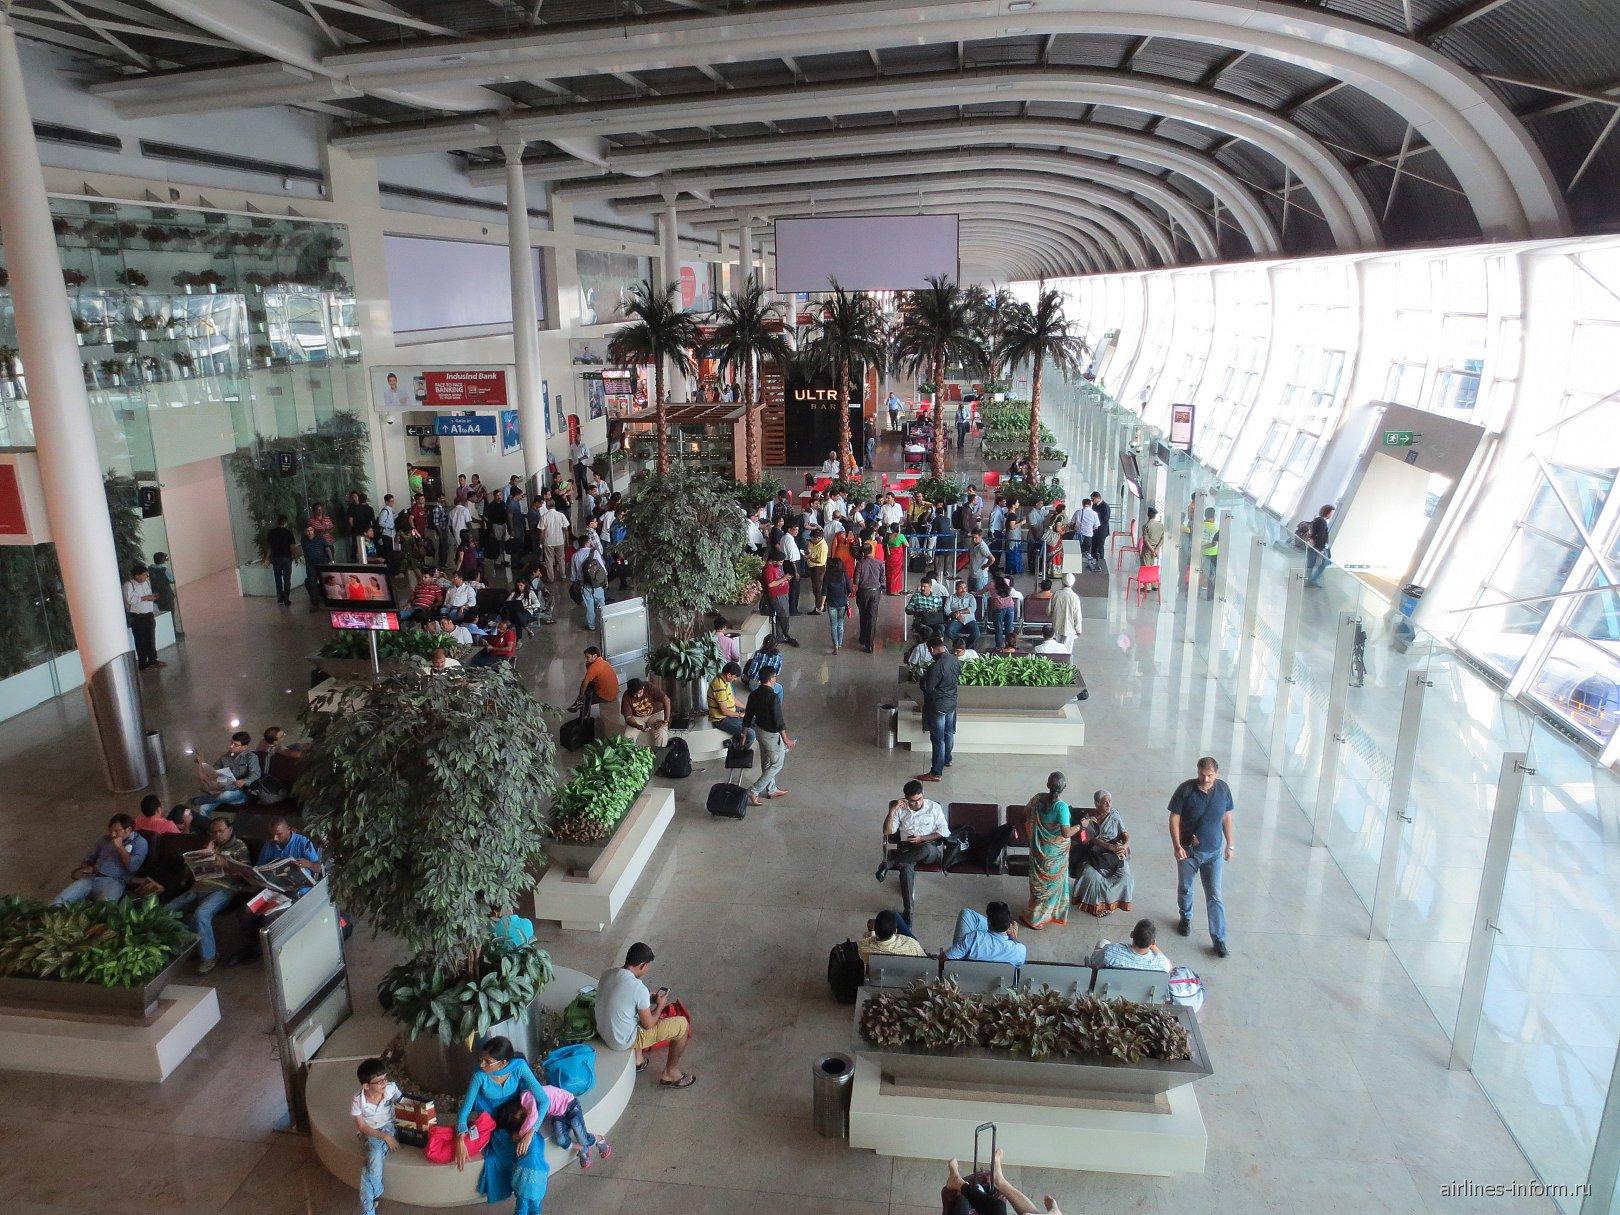 Зона выходов на посадку в аэропорту Мумбай Чатрапати Шиваджи